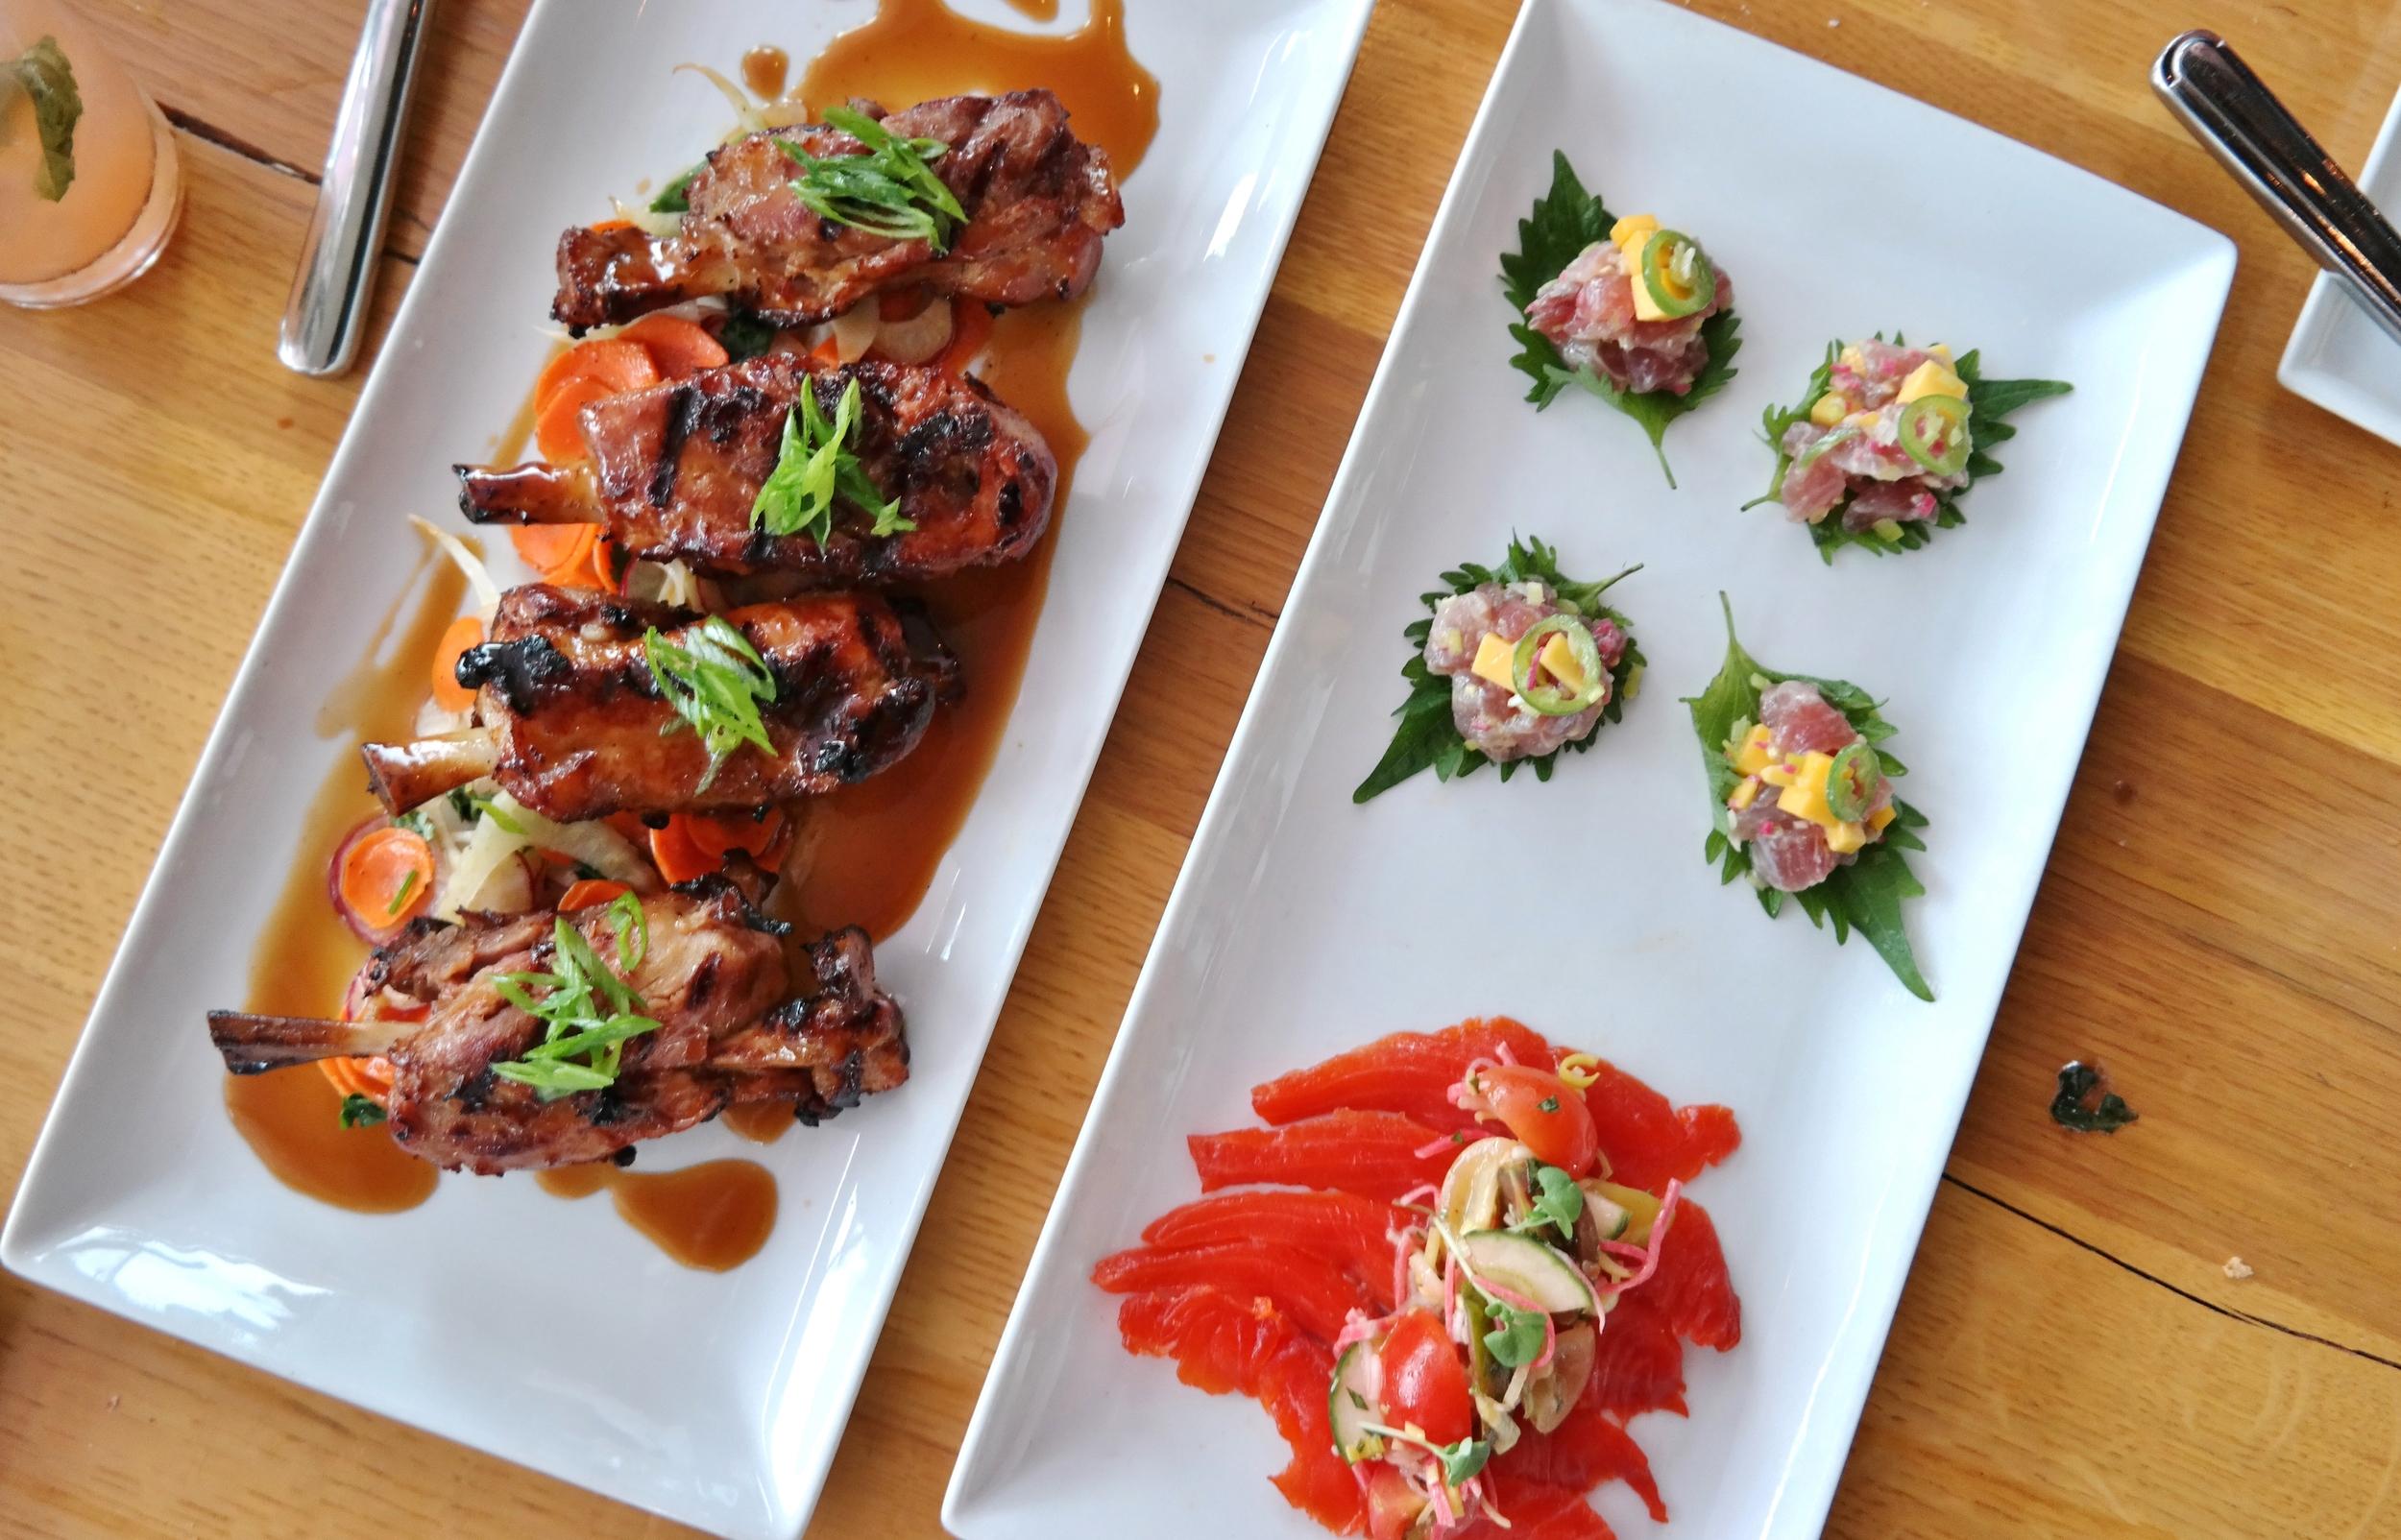 Market Street Kitchen: Piggy Wings, lomi lomi, and big eye poke